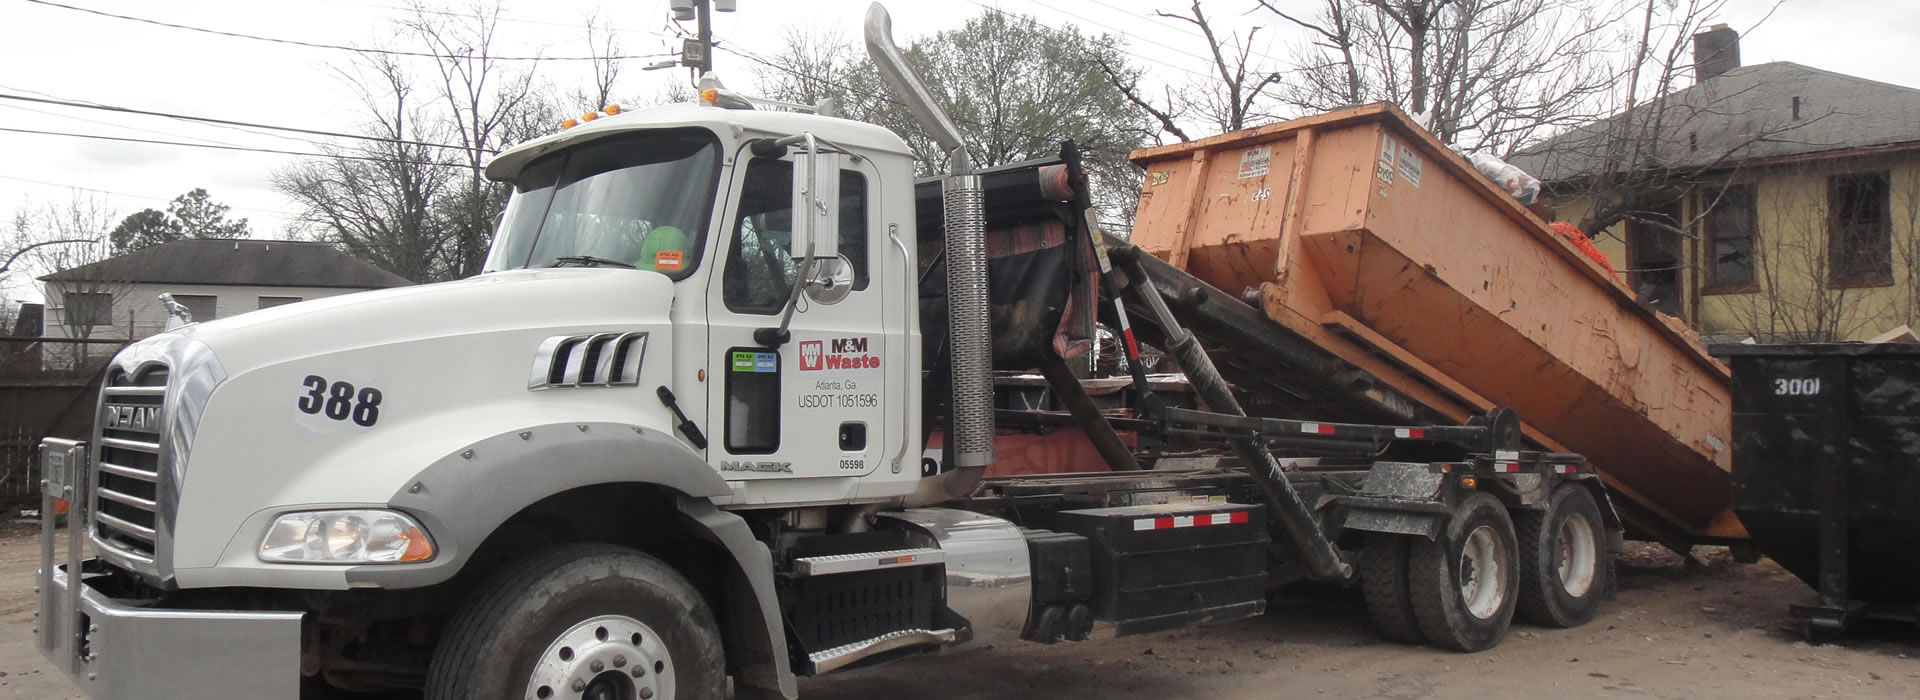 Dumpster Rental in Dunwoody GA   Rent Roll Off Dumpsters